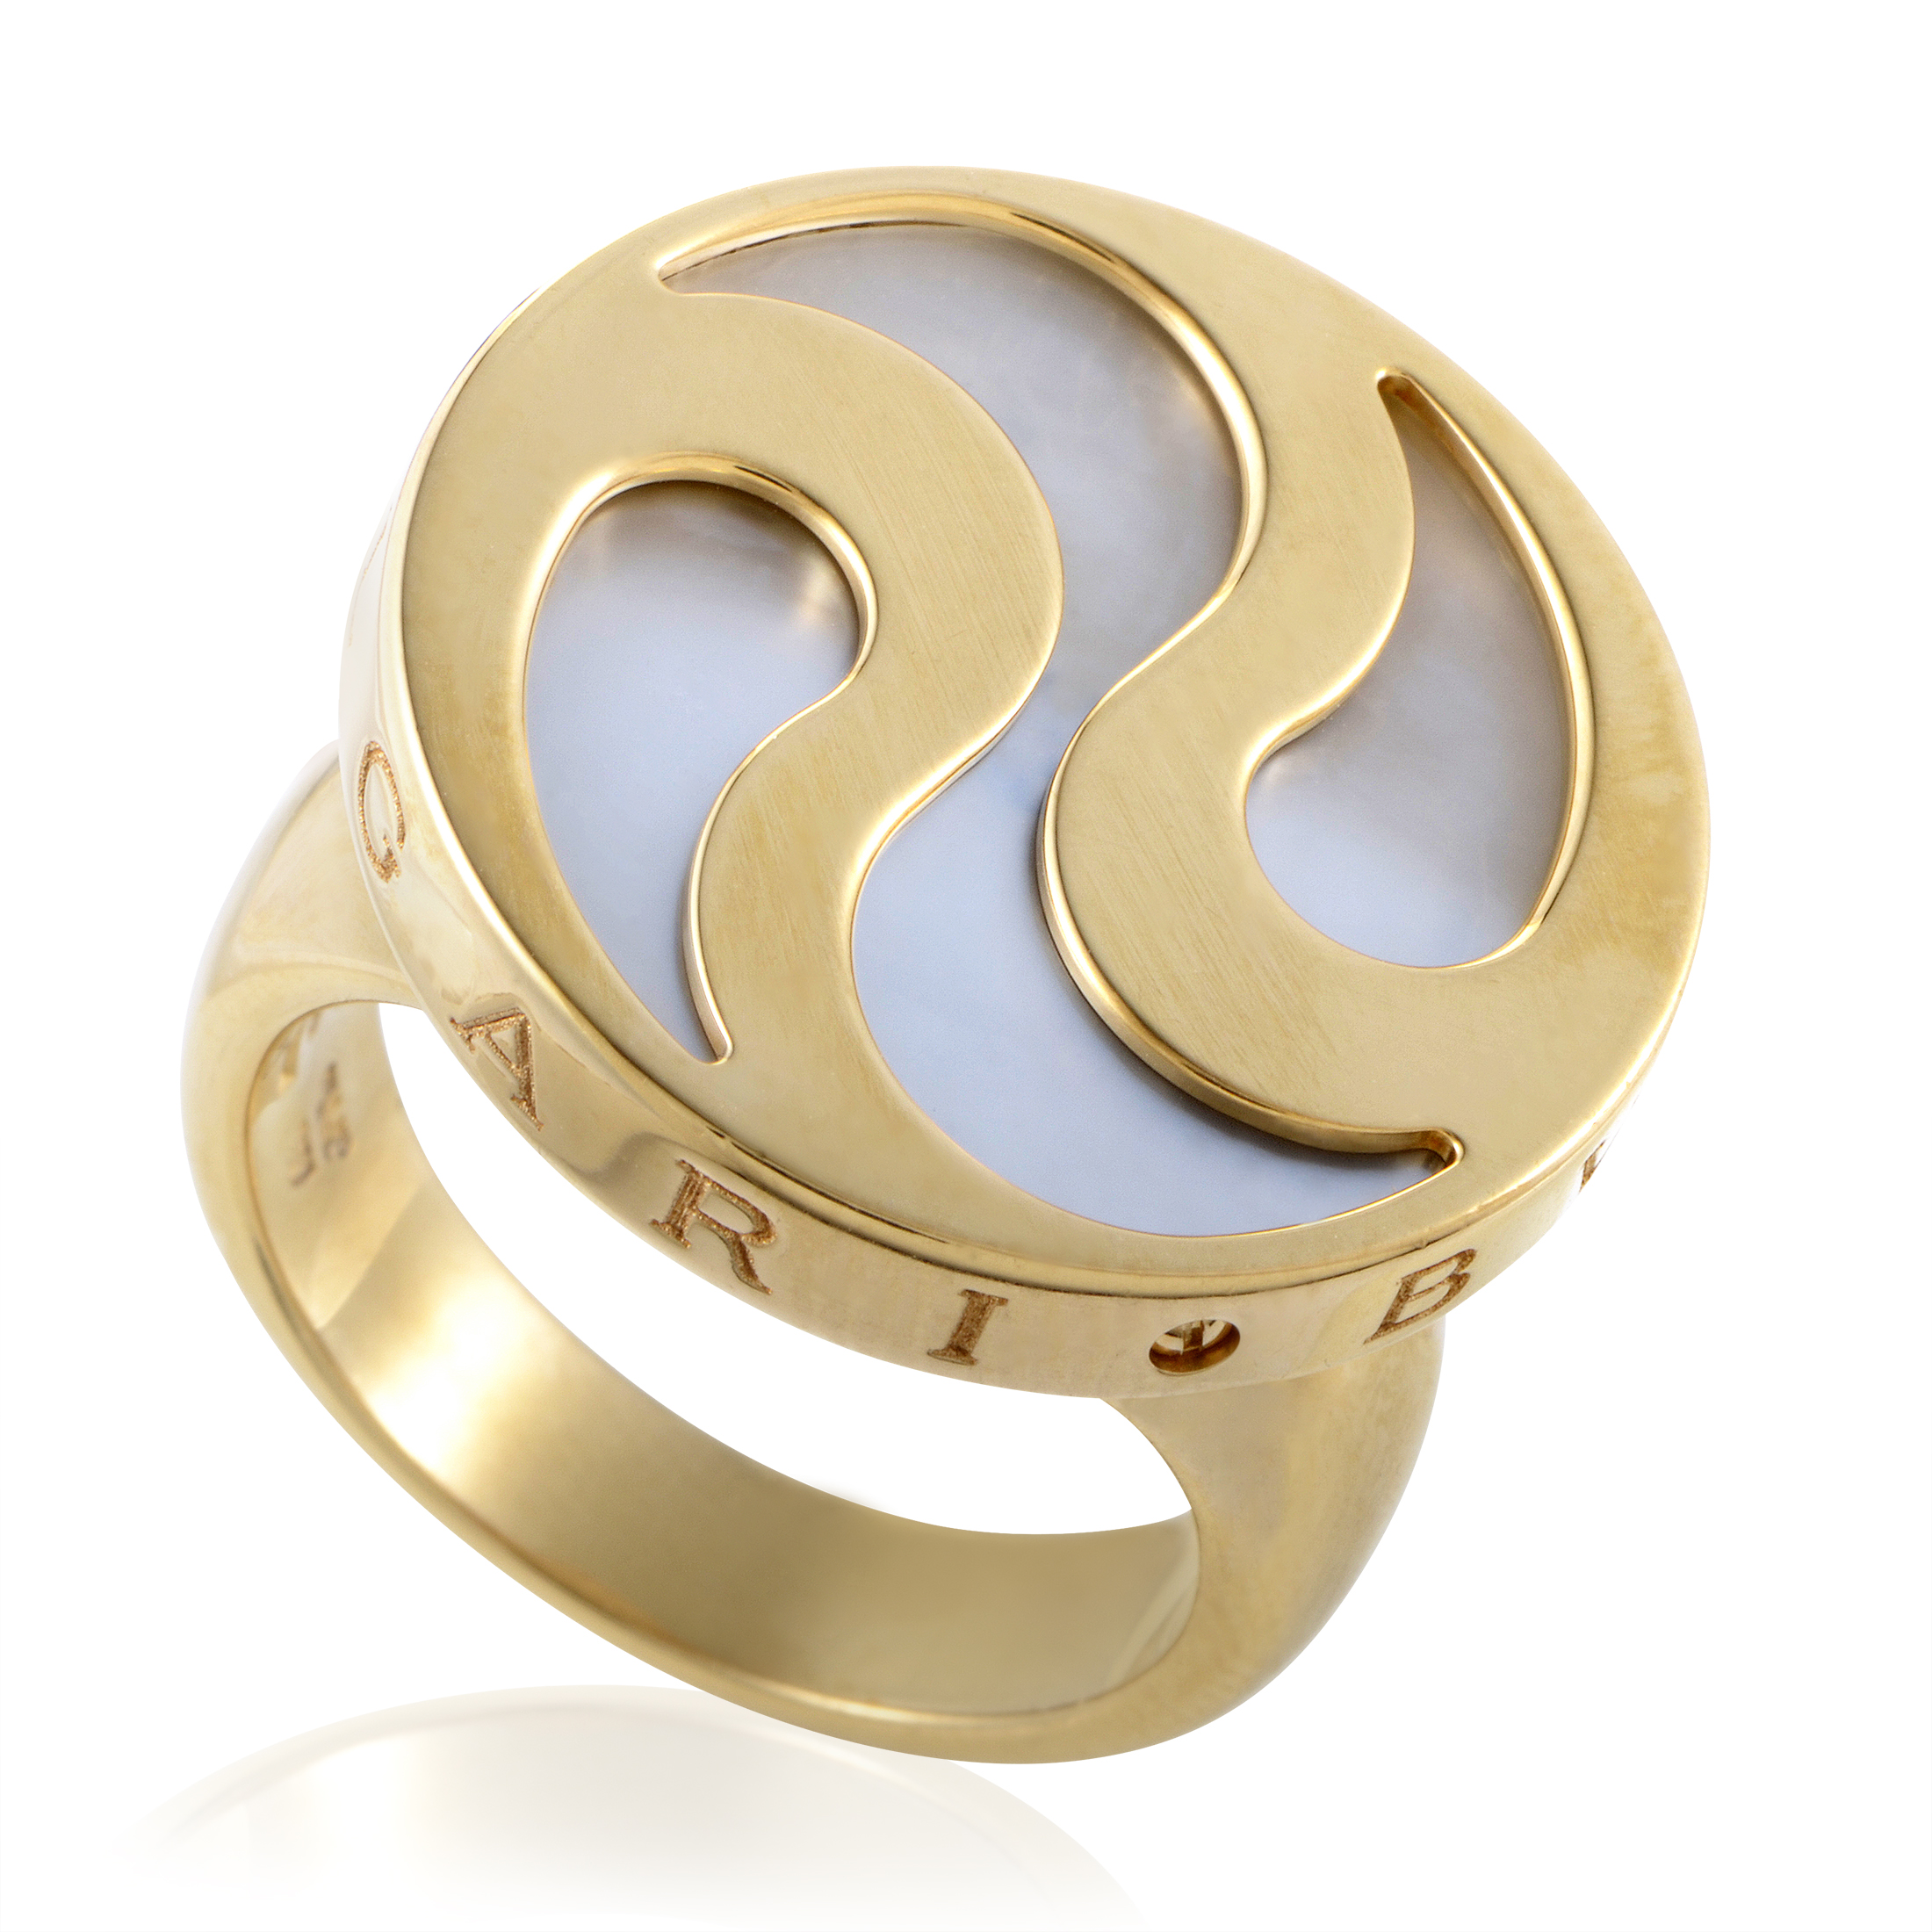 Bvlgari Hypnotic Women's 18K Yellow Gold Mother of Pearl Ring